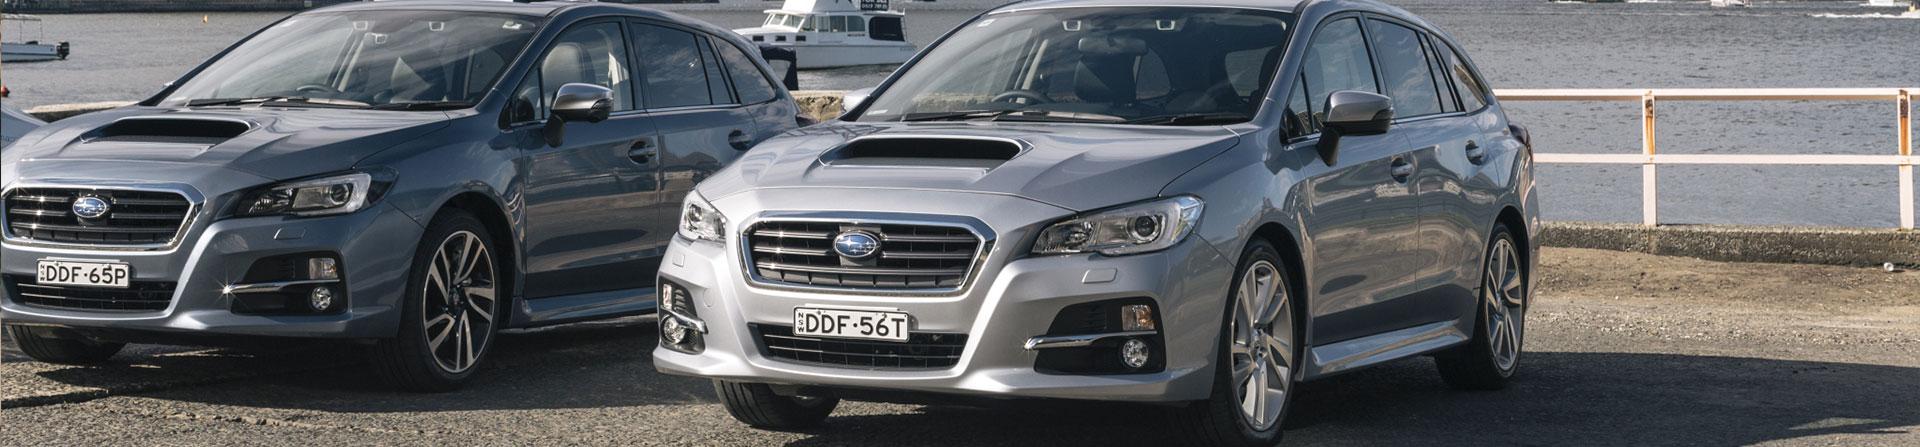 Subaru Levorg Image 5